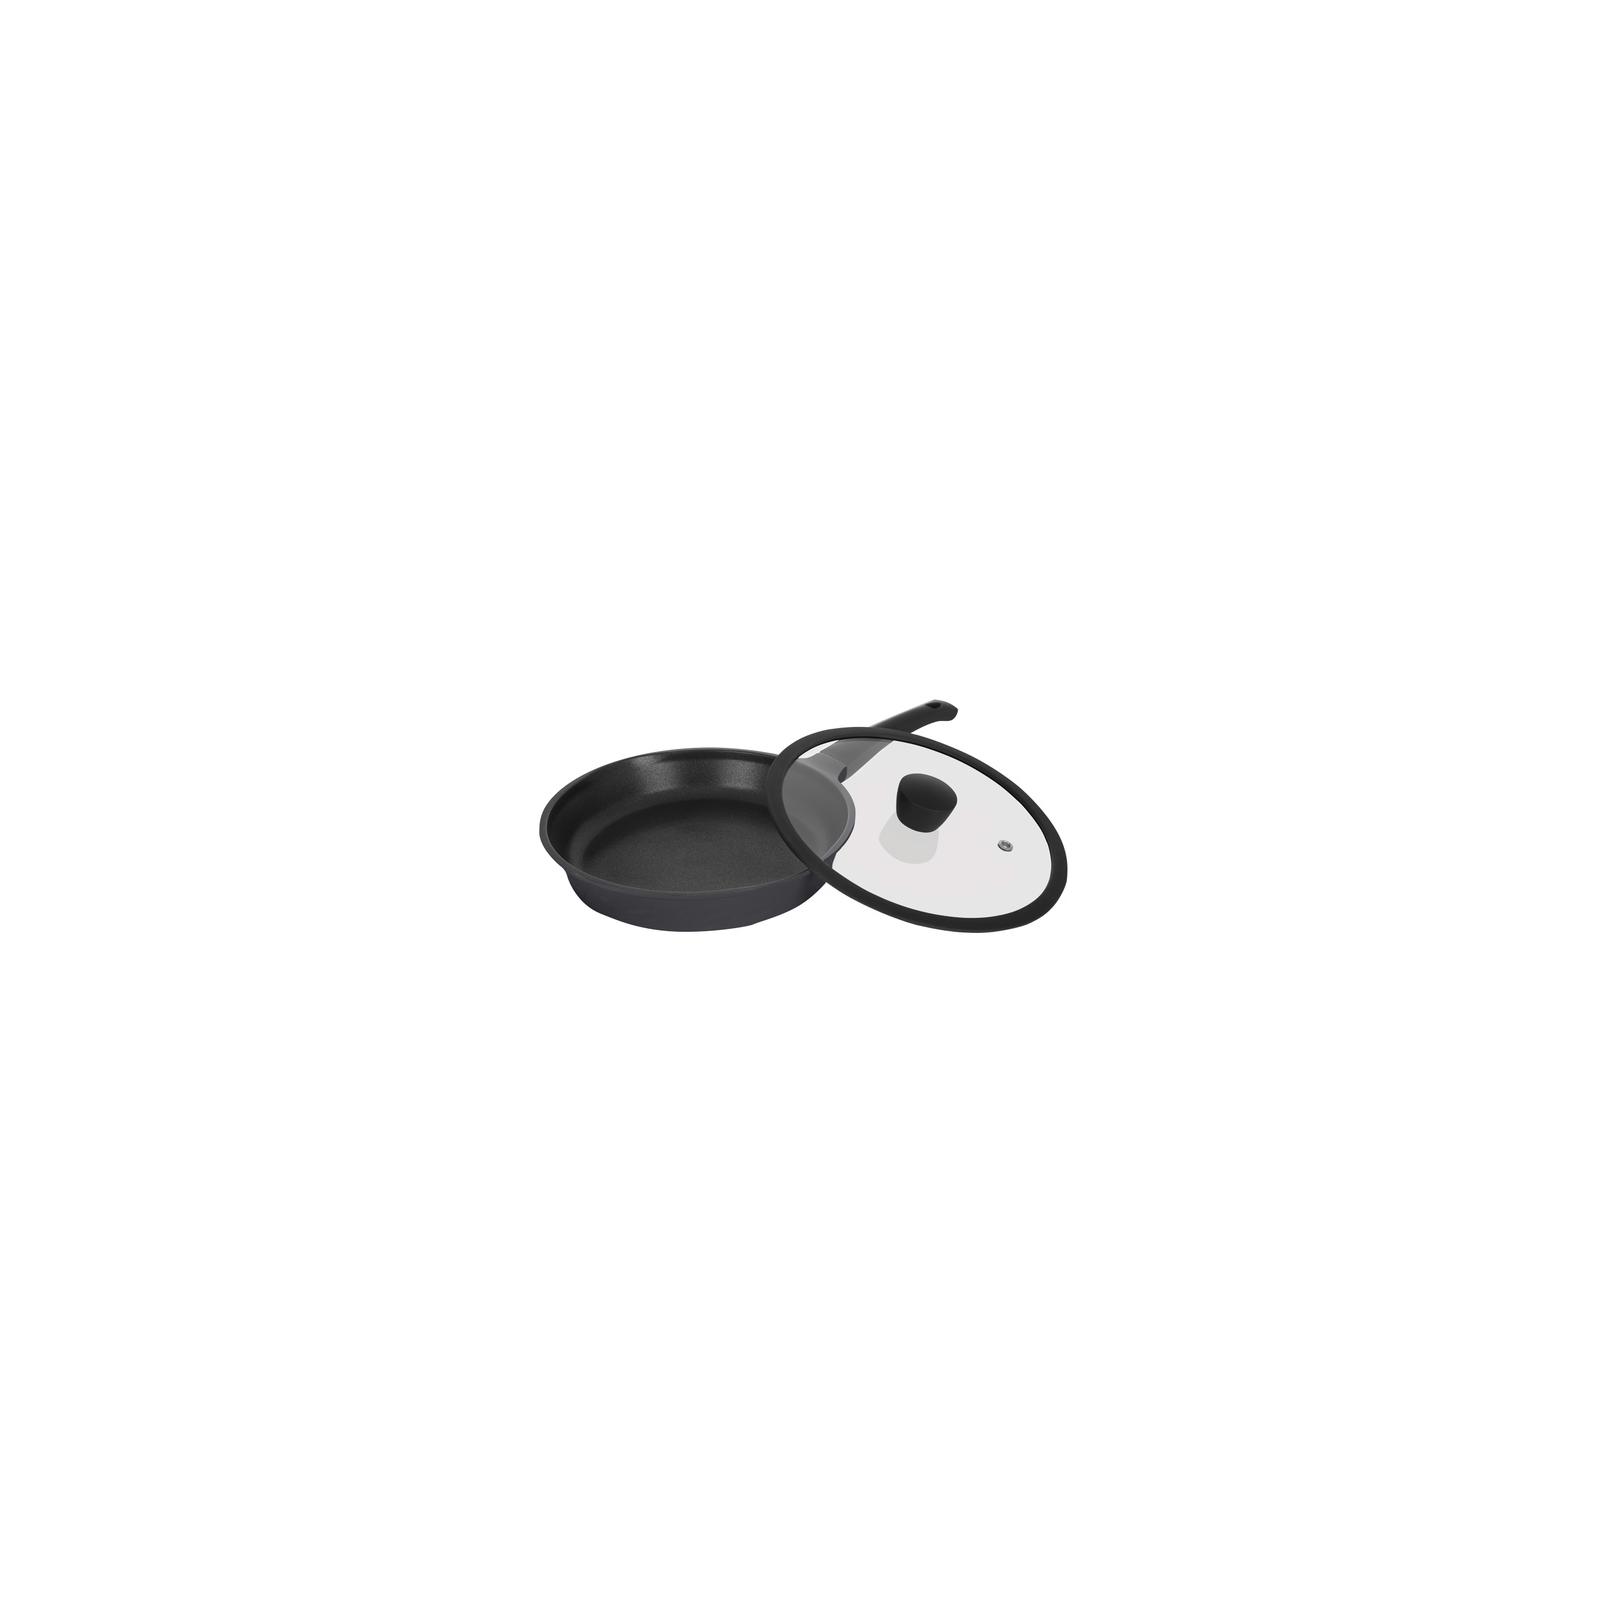 Сковорода Ringel Zitrone black с крышкой 28 см (RG-2108-28 BL)